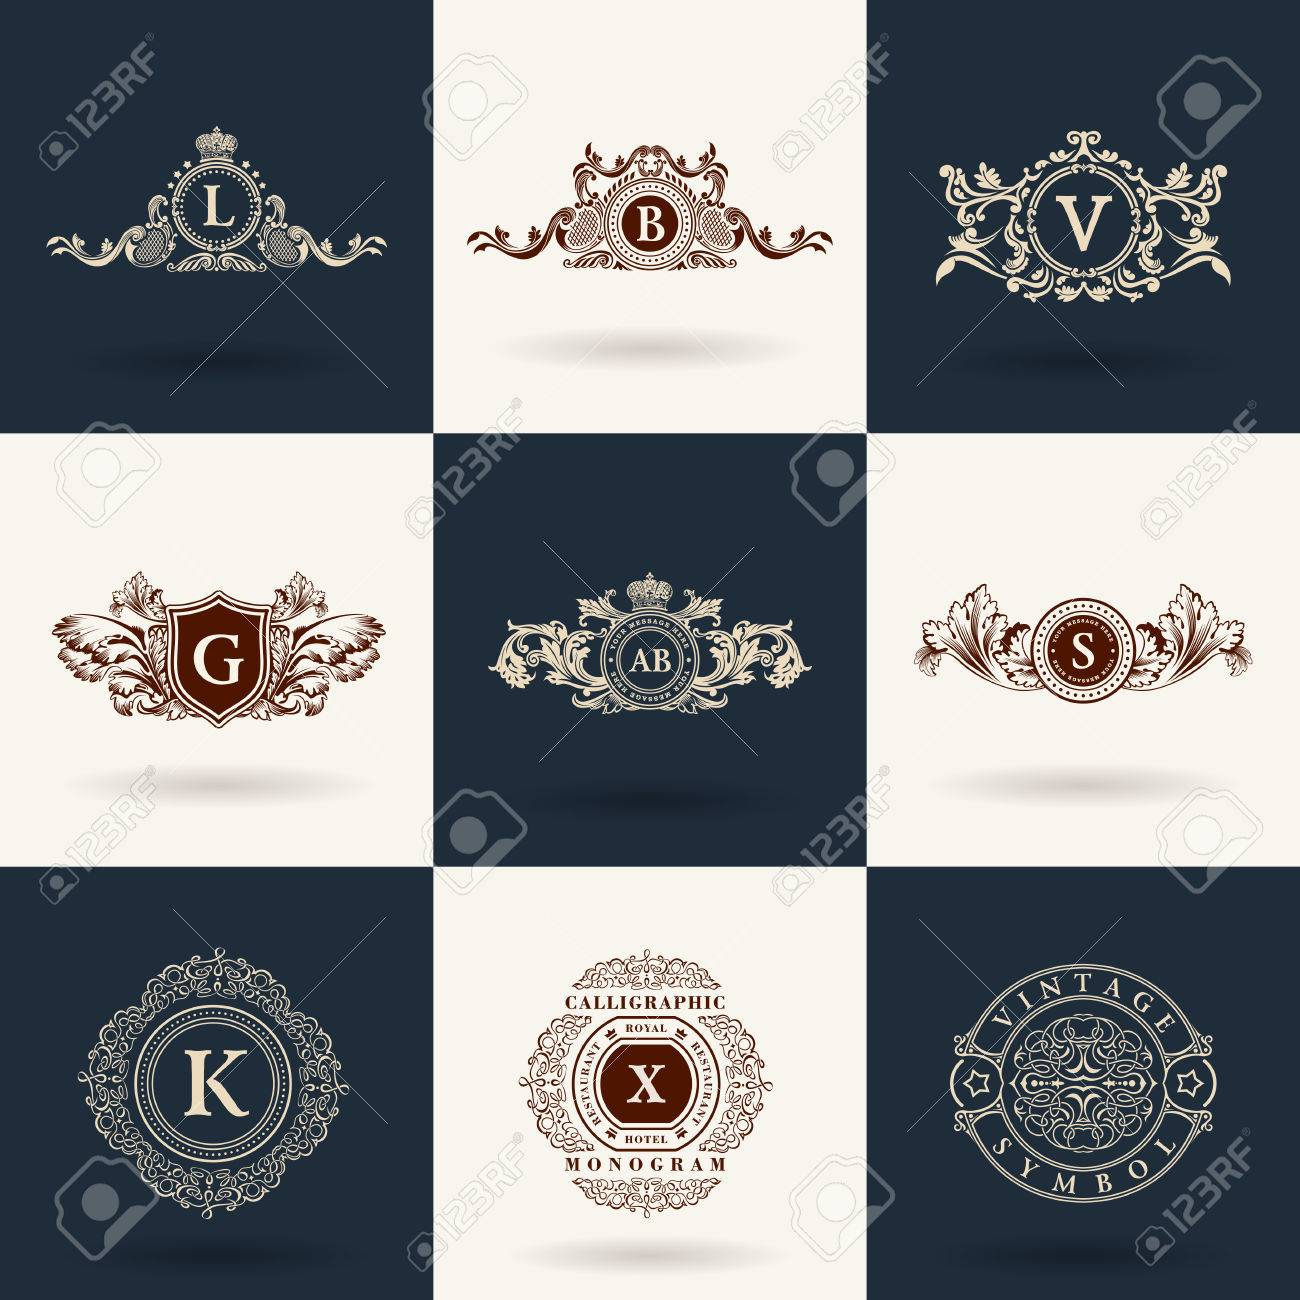 Luxury monogram. Vintage royal flourishes elements. Calligraphic symbol ornament. - 52984534